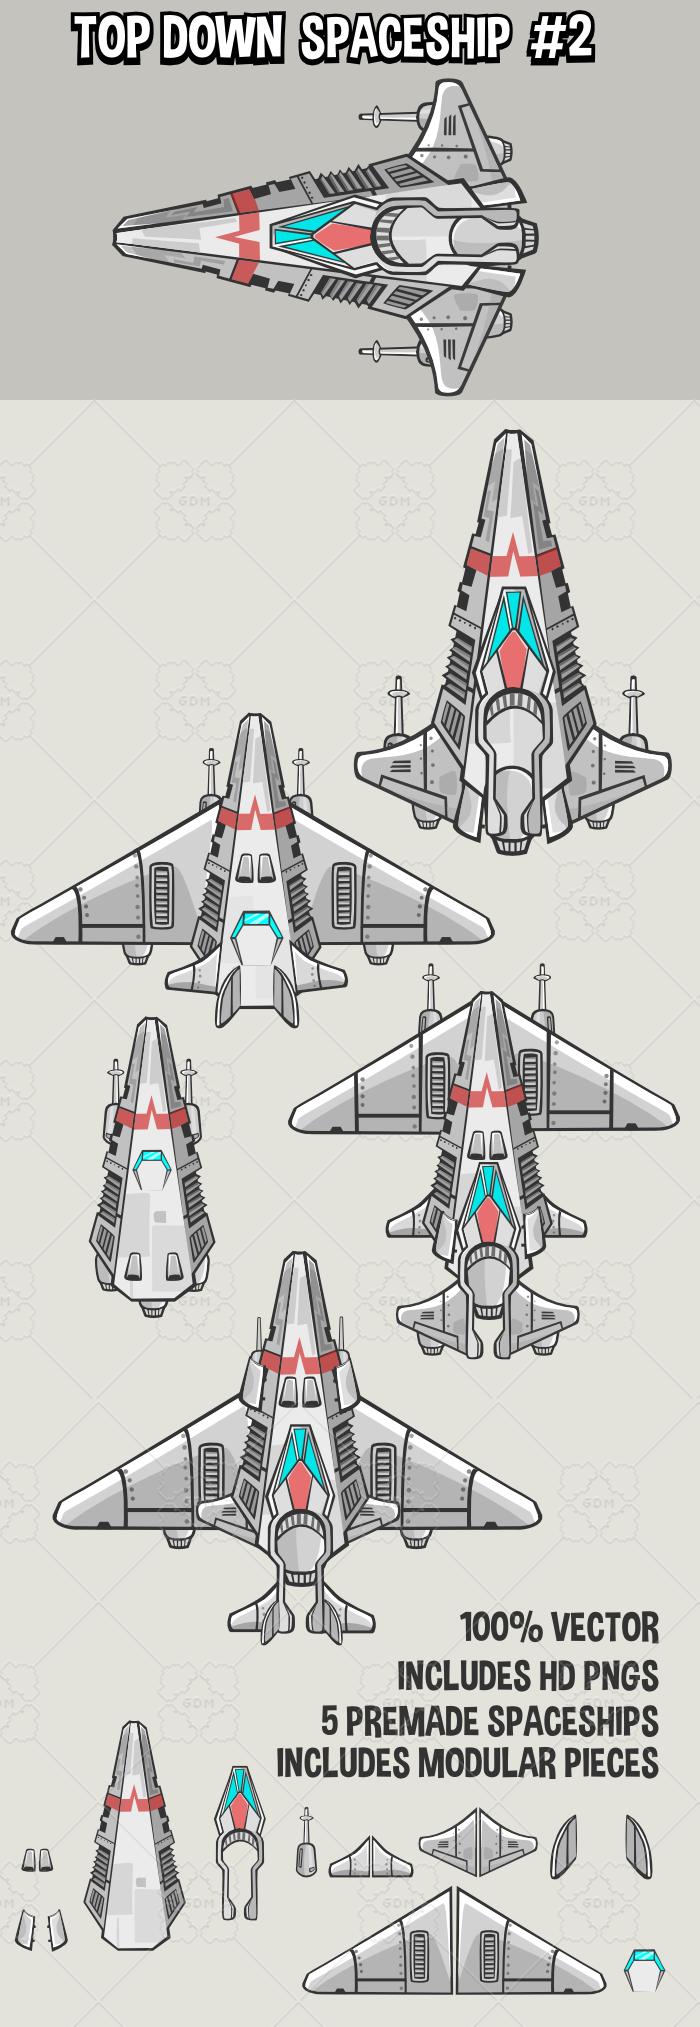 Top down spaceship 2